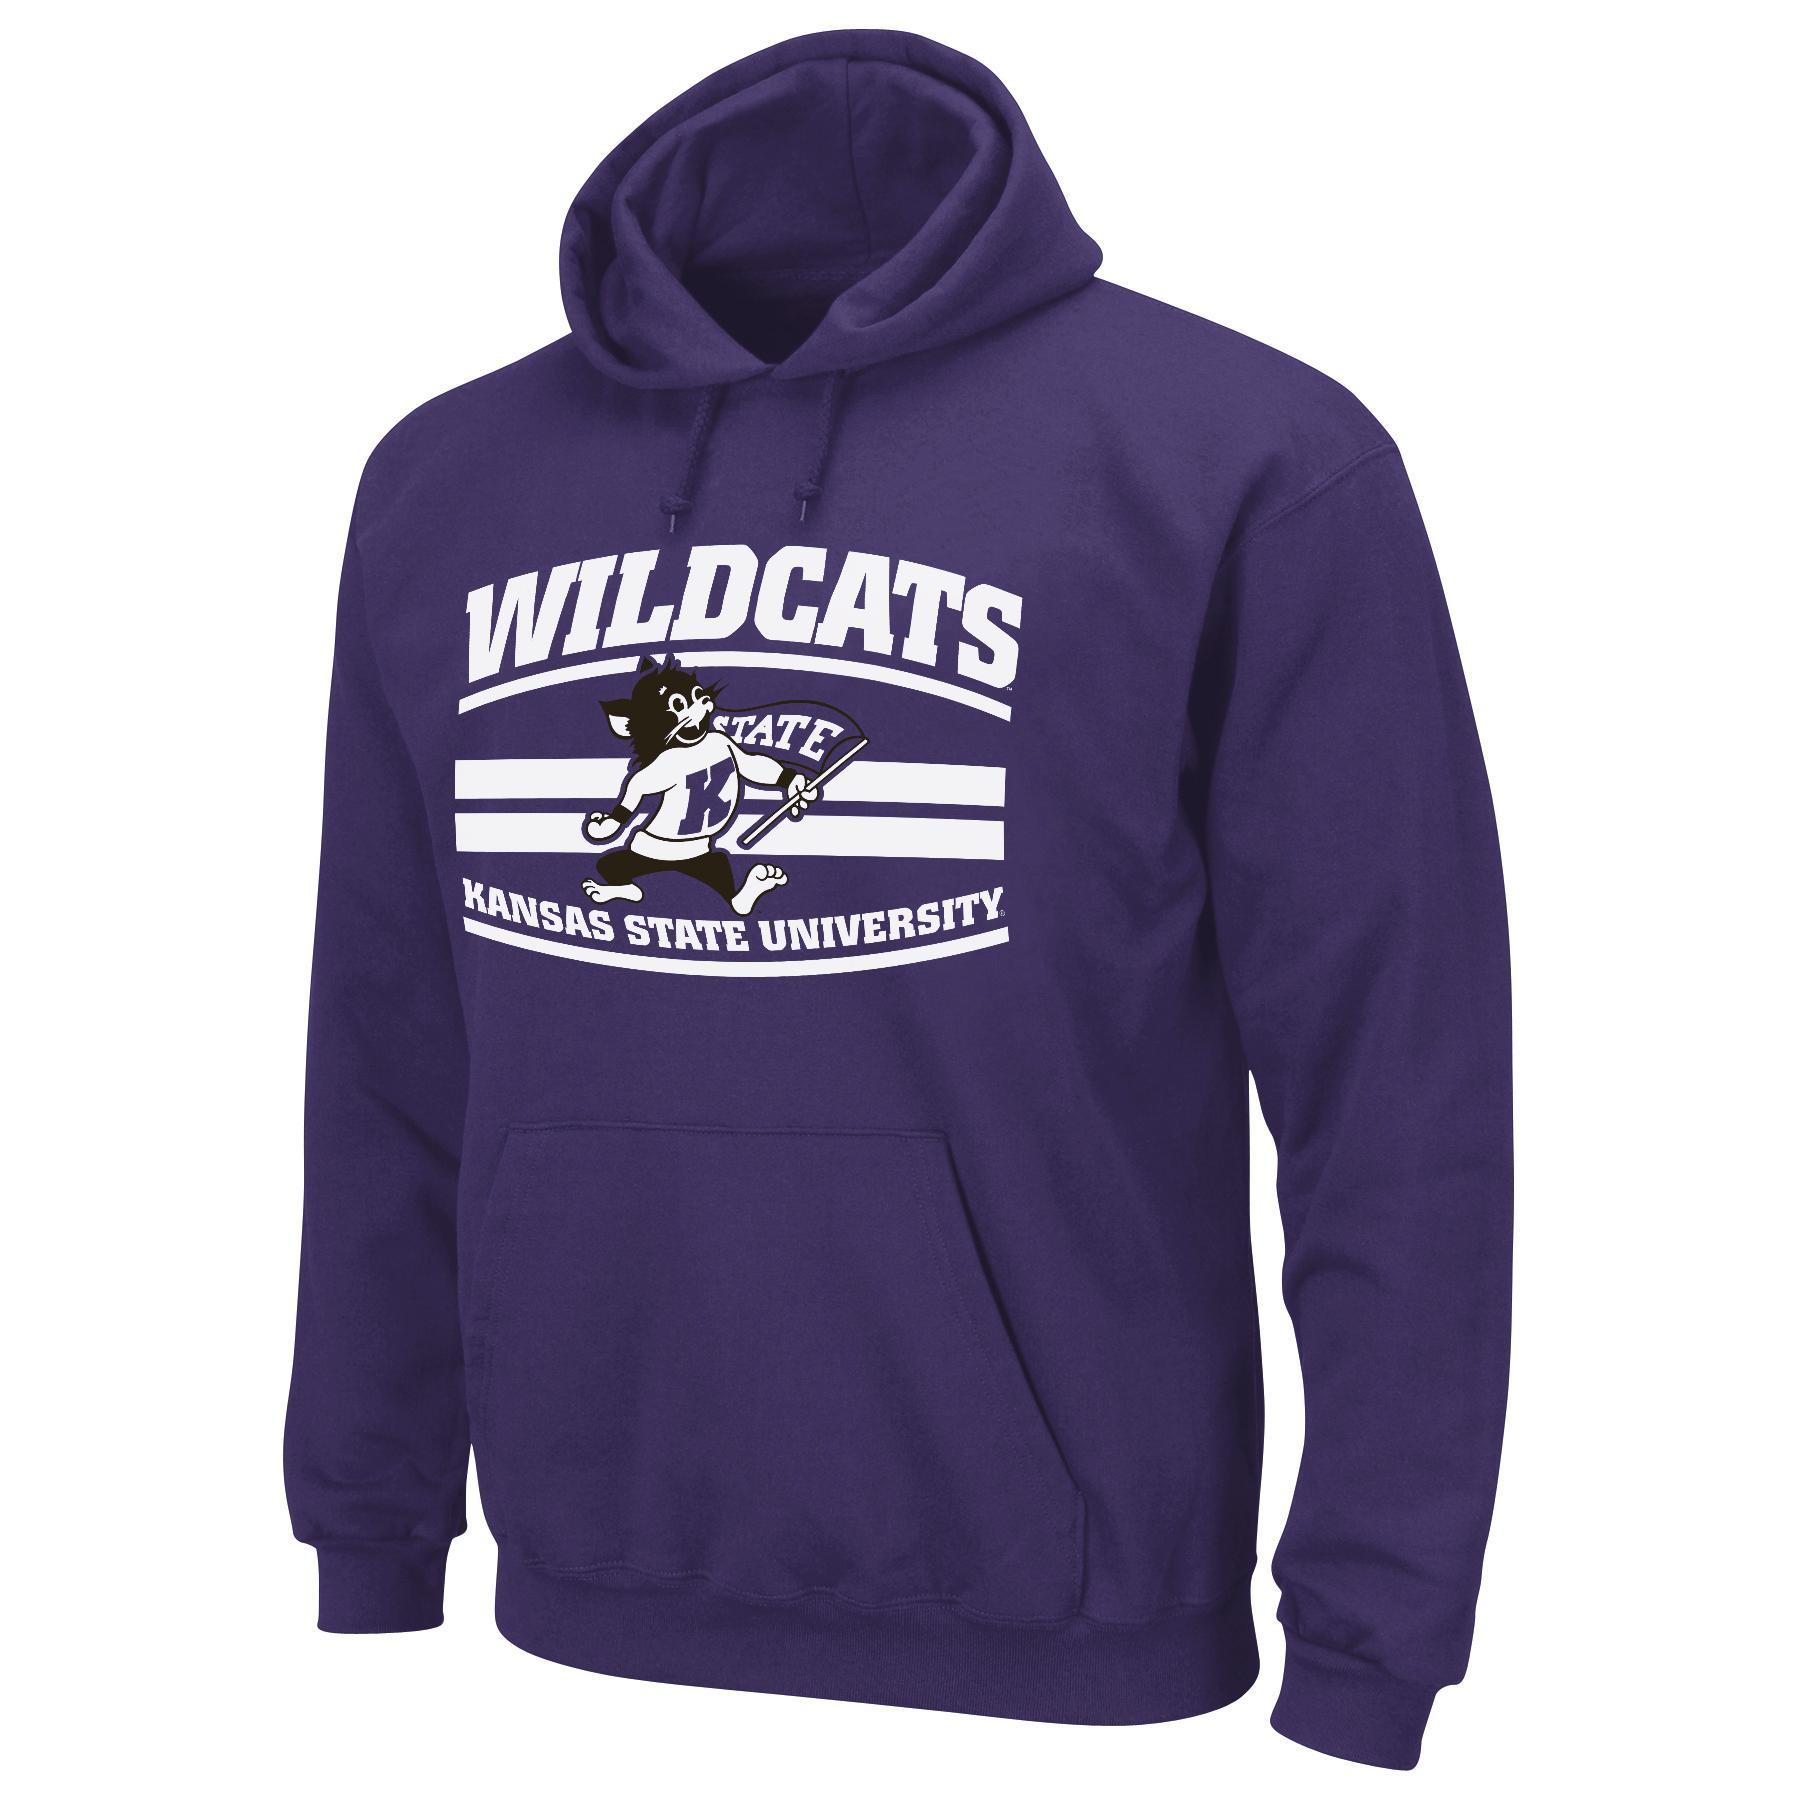 NCAA Men's Hooded Sweatshirt - Kansas State University Wildcats